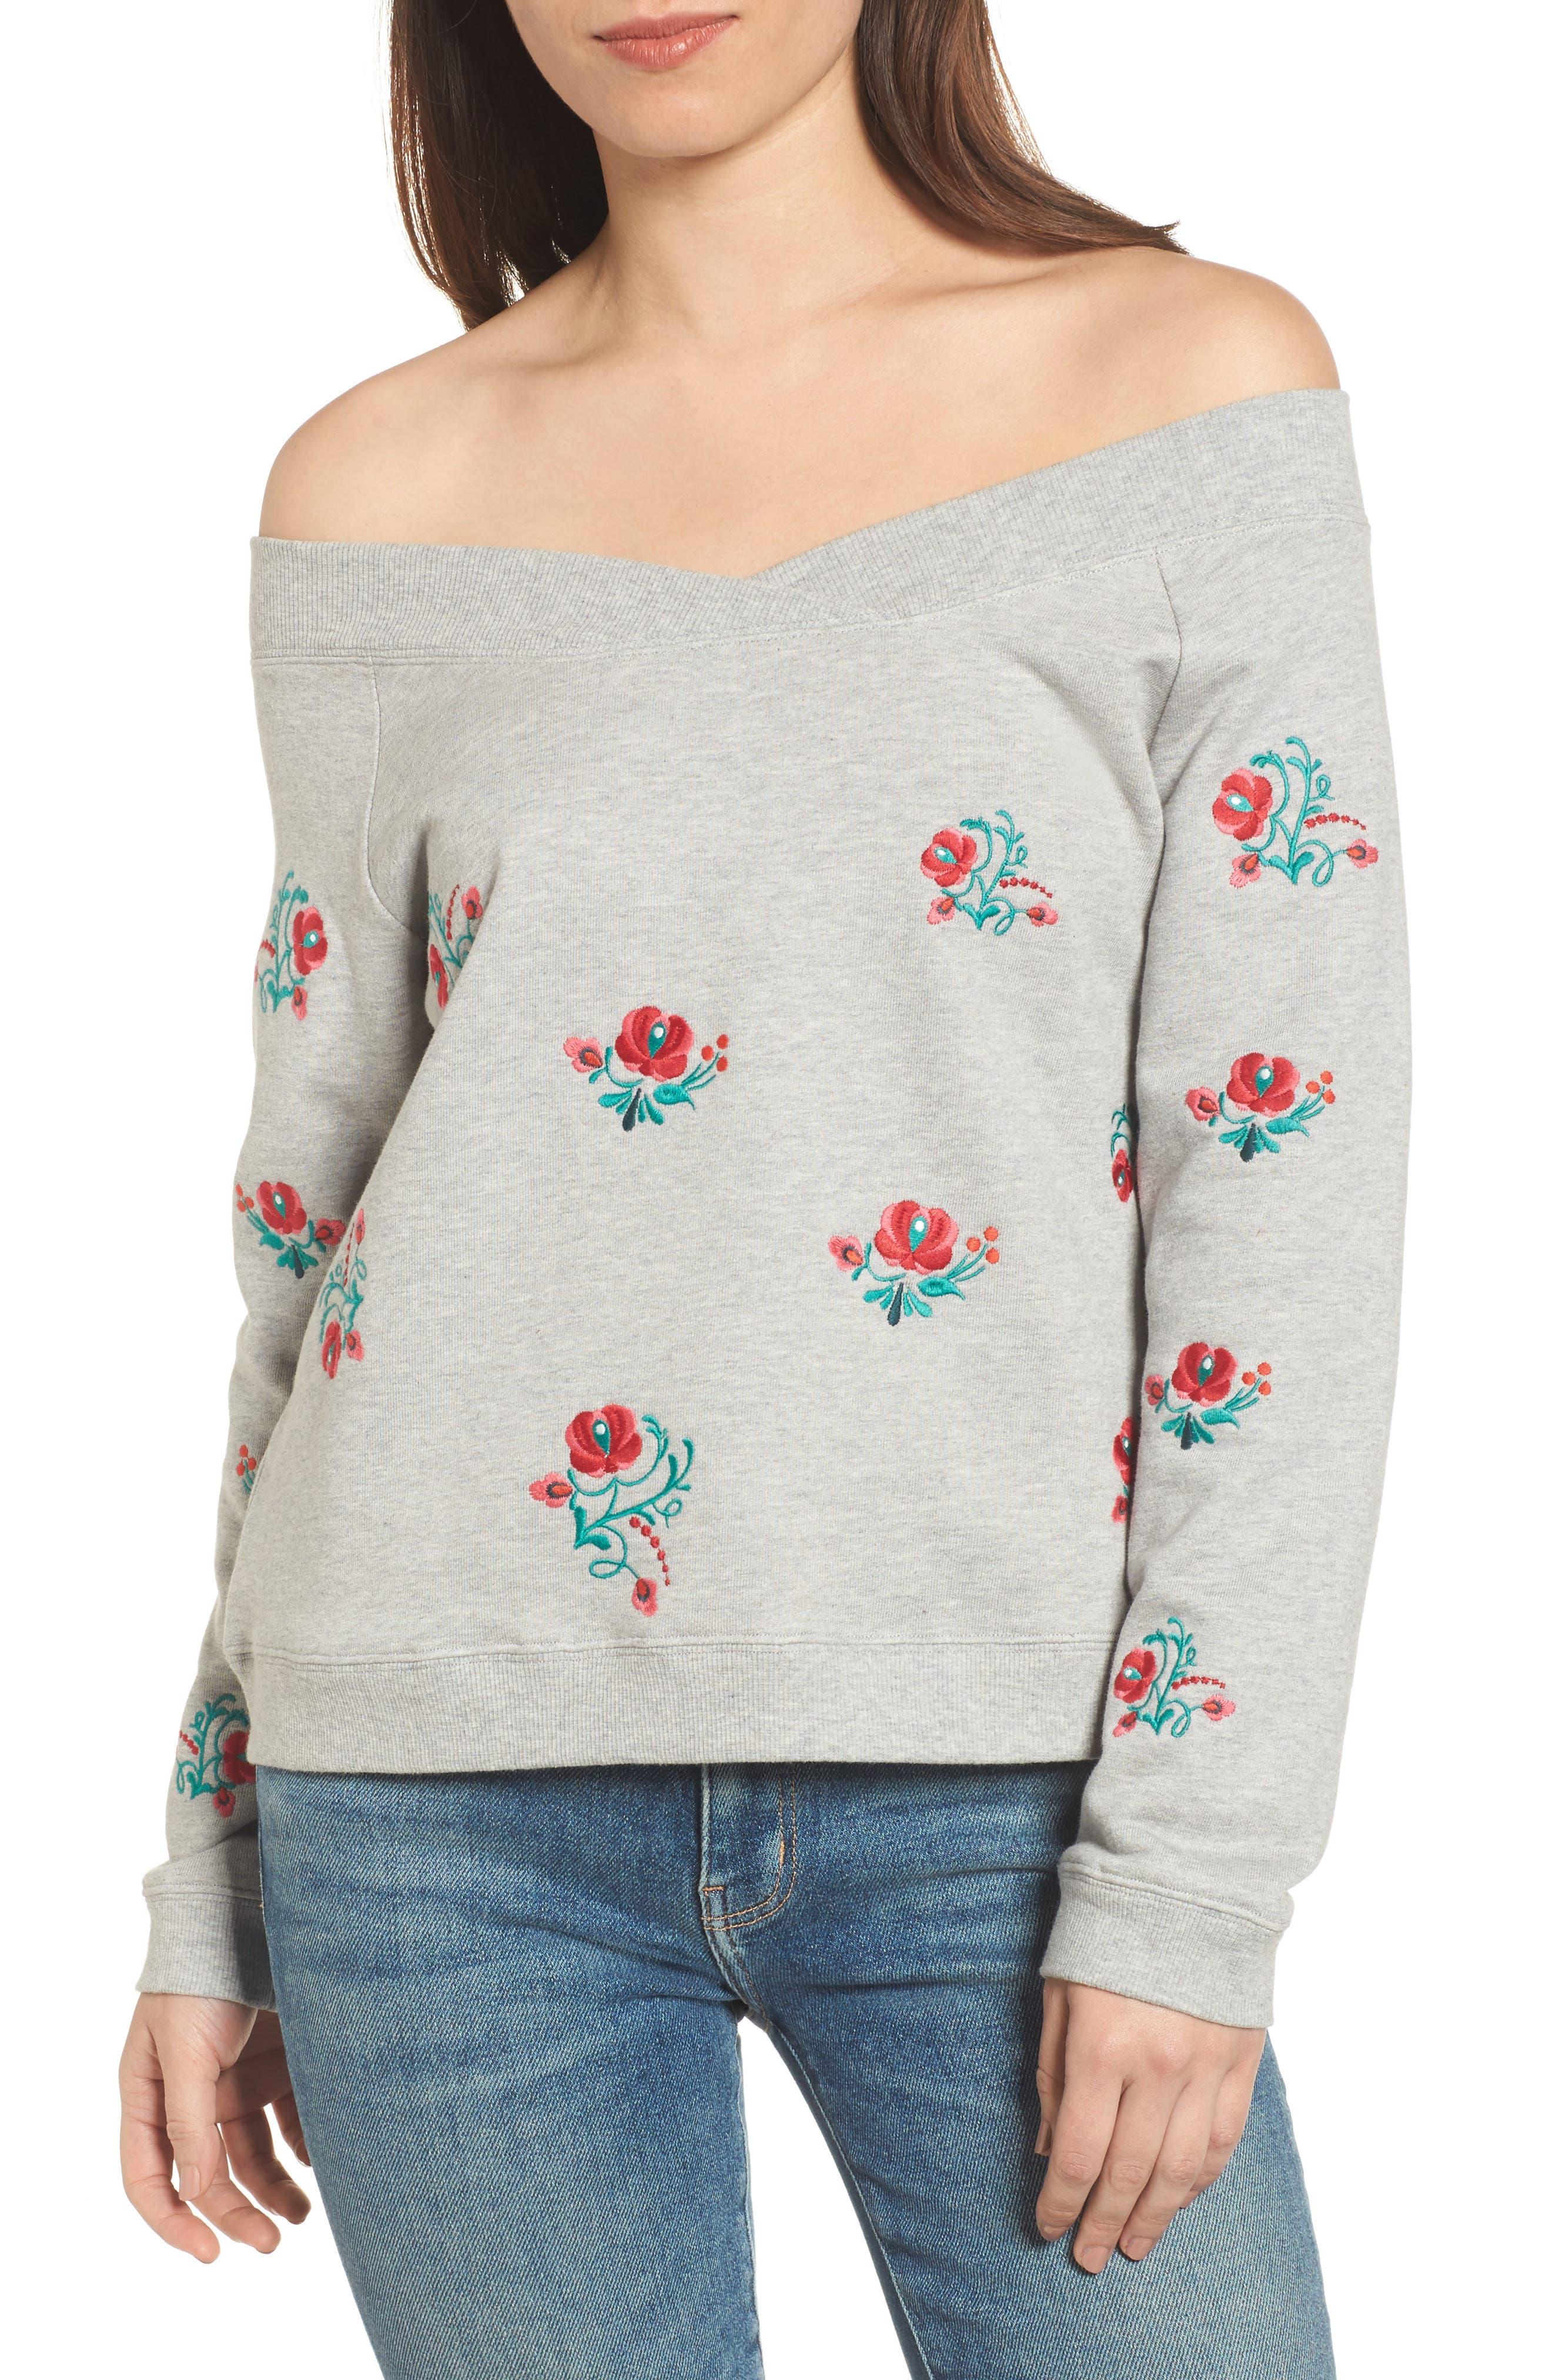 Rebecca Minkoff Macey Off the Shoulder Sweatshirt